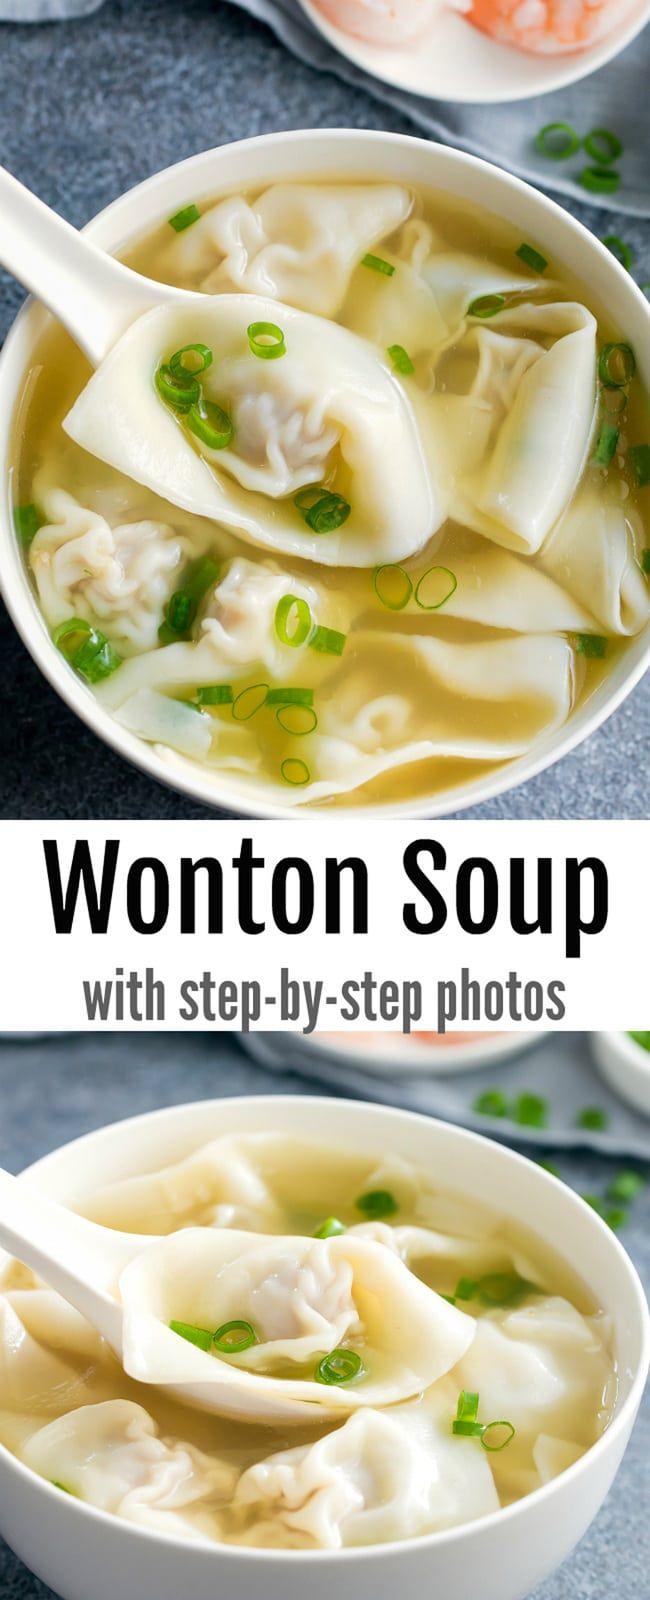 Wonton Soup #easythingstocook